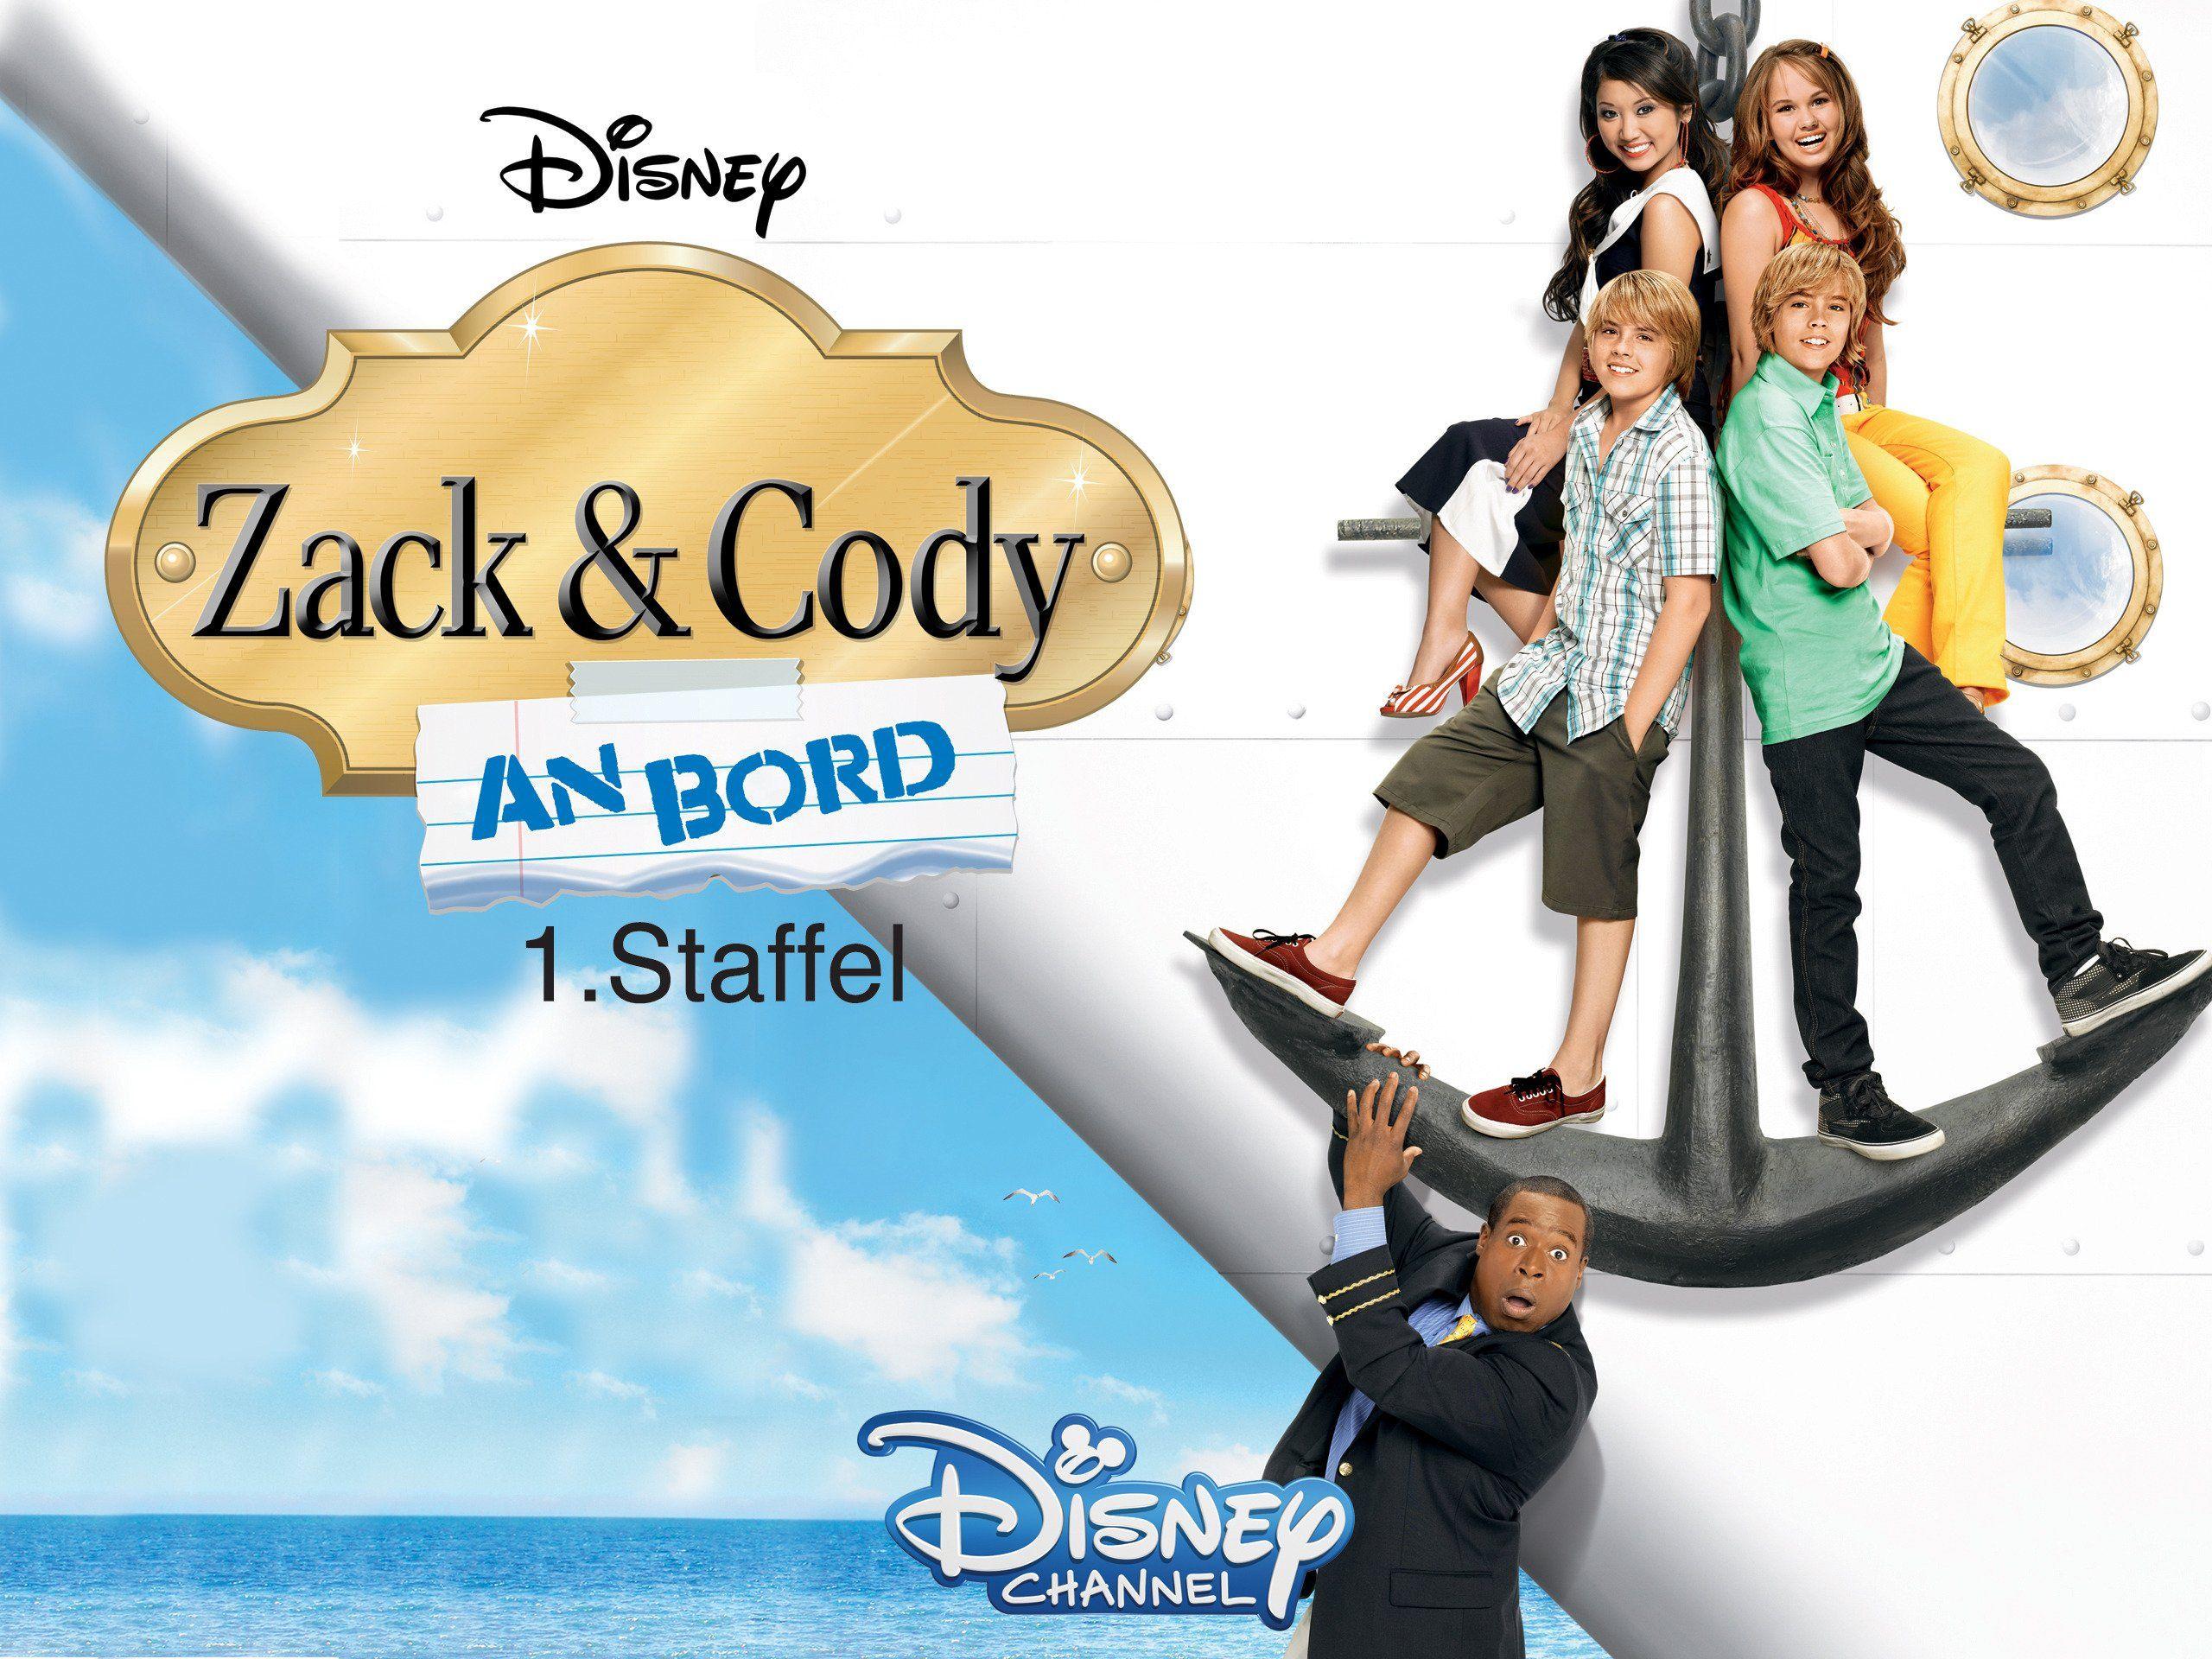 [Amazon Video] Disney Zack & Cody an Board - Staffel 1 SD - 21 Folgen - [Preisfehler]